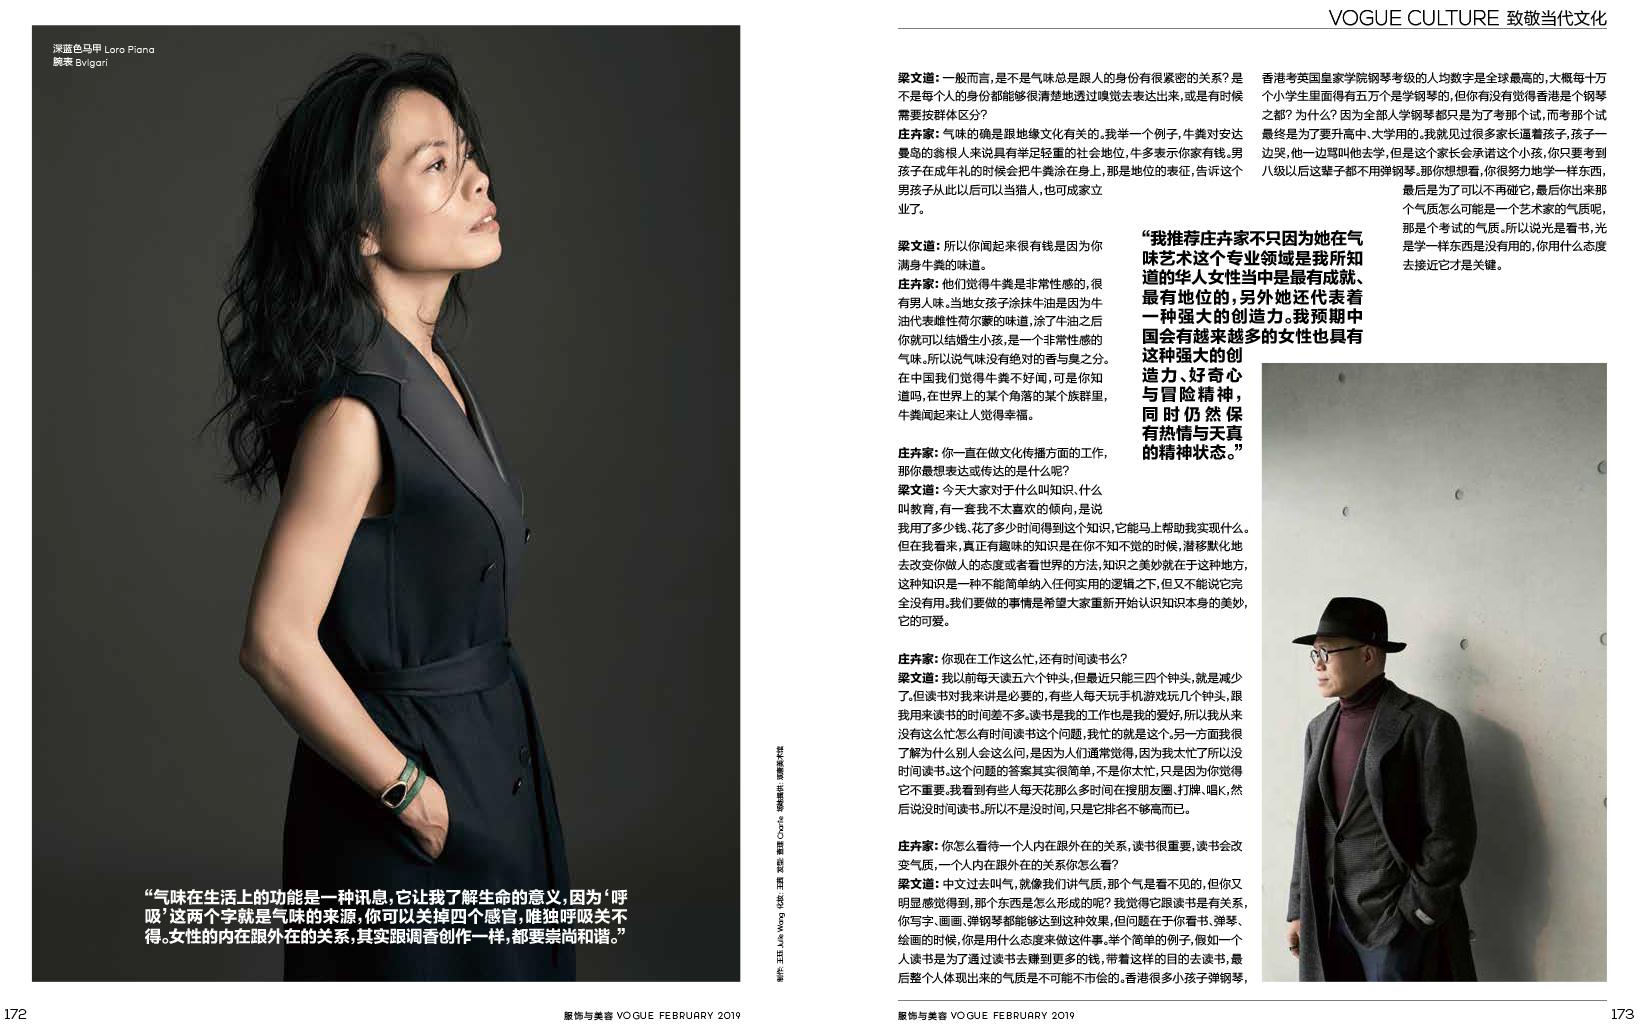 Vogue19_2 copy.jpg